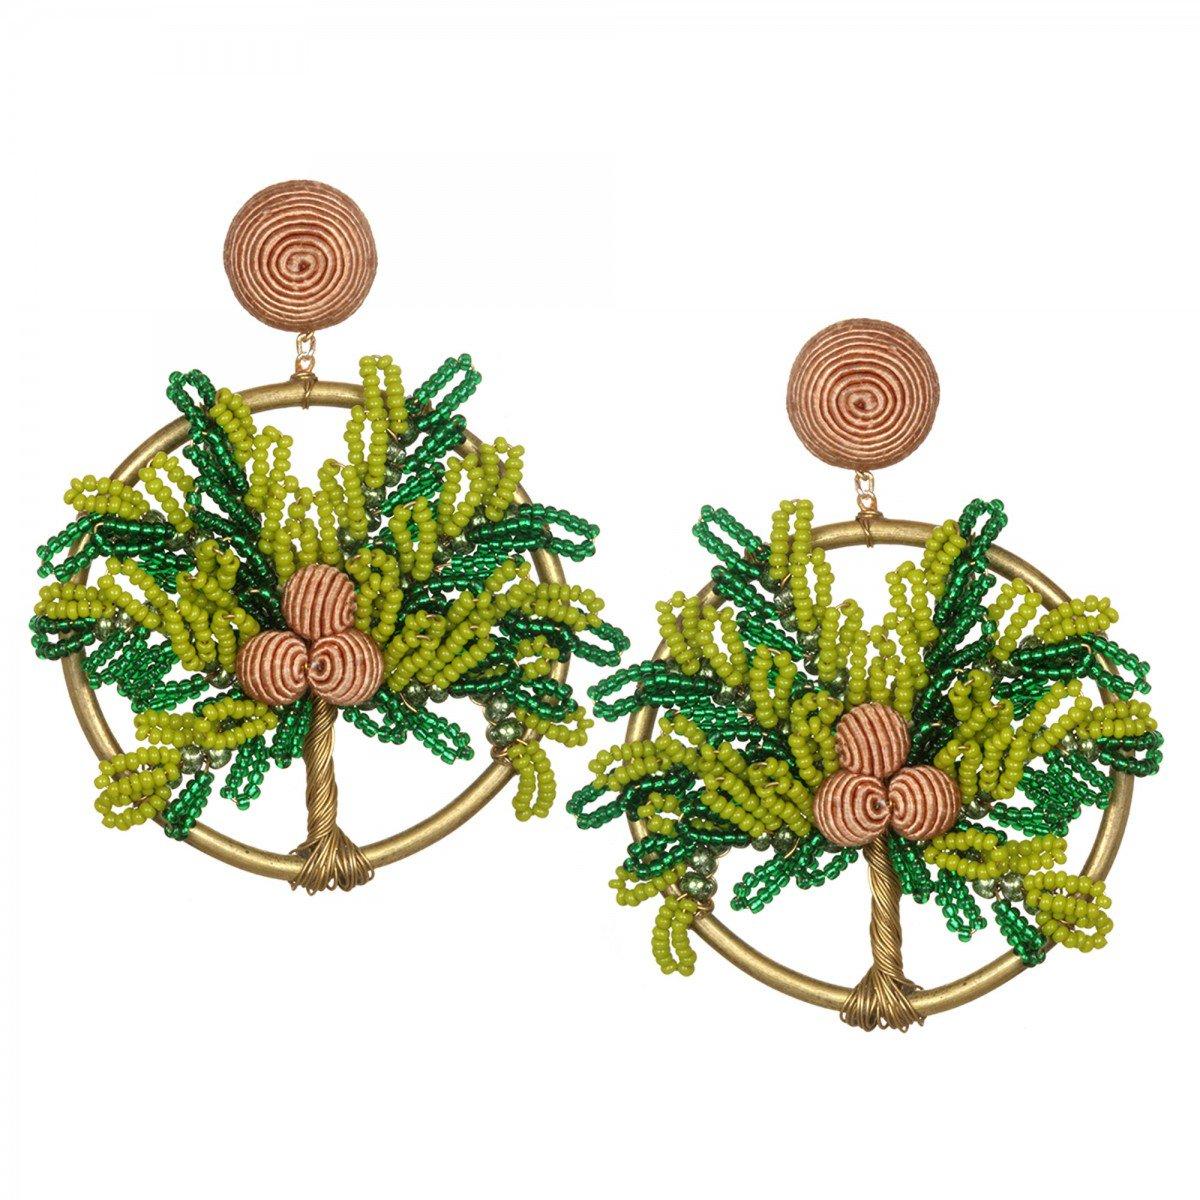 suzanna-dai-green-gold-palma-hoop-earrings.jpg